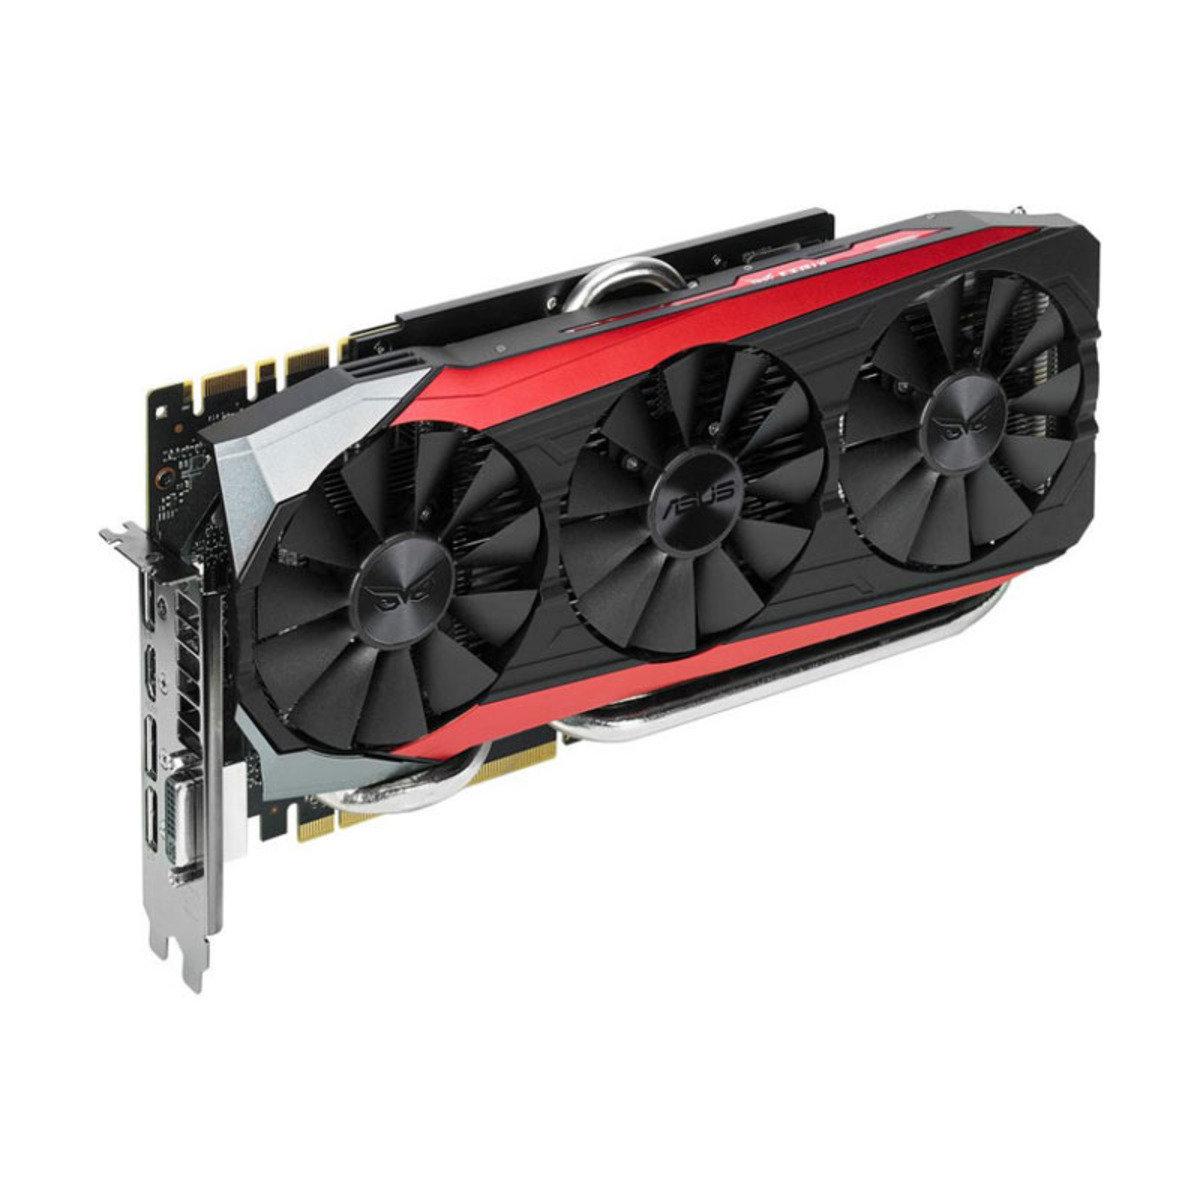 GTX980Ti 6GB GDDR5 PCI-E 頂級效能獨立顯示卡 STRIX-GTX980TI-DC3-6GD5